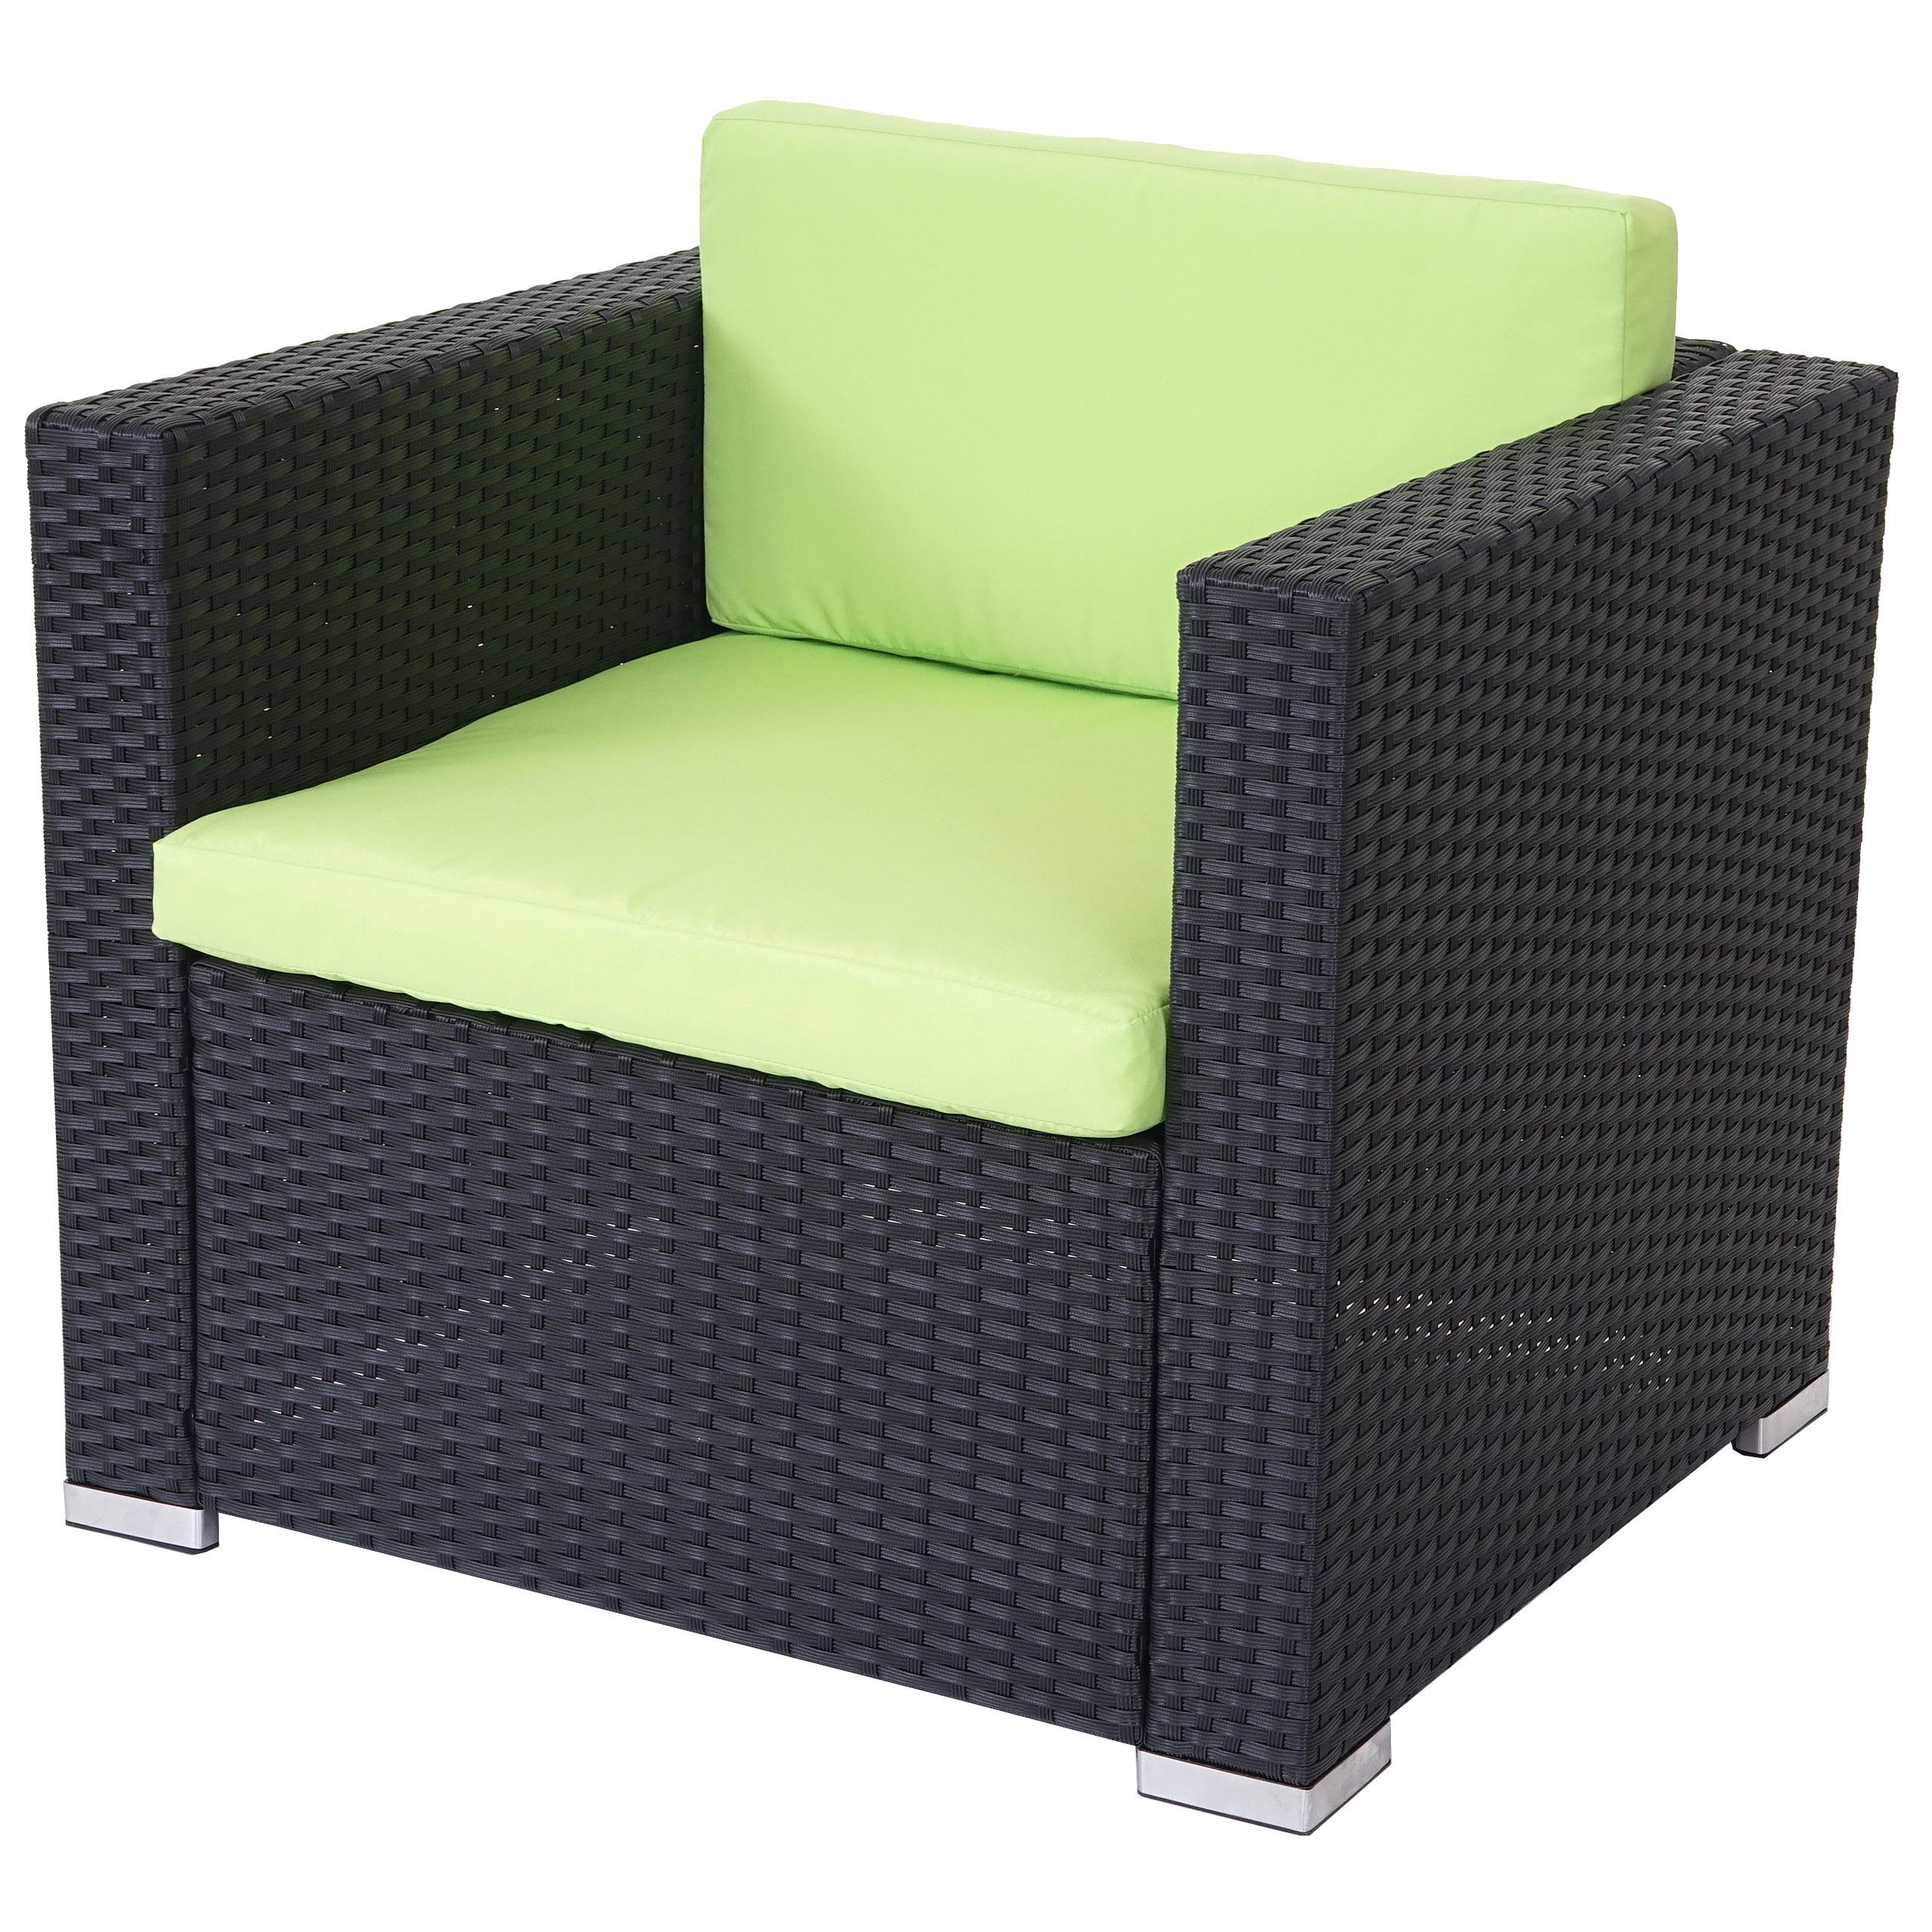 Erstaunlich Sofa Grün Sammlung Von Modulares Poly-rattan Rom Basic, Sessel Loungesessel, Alu